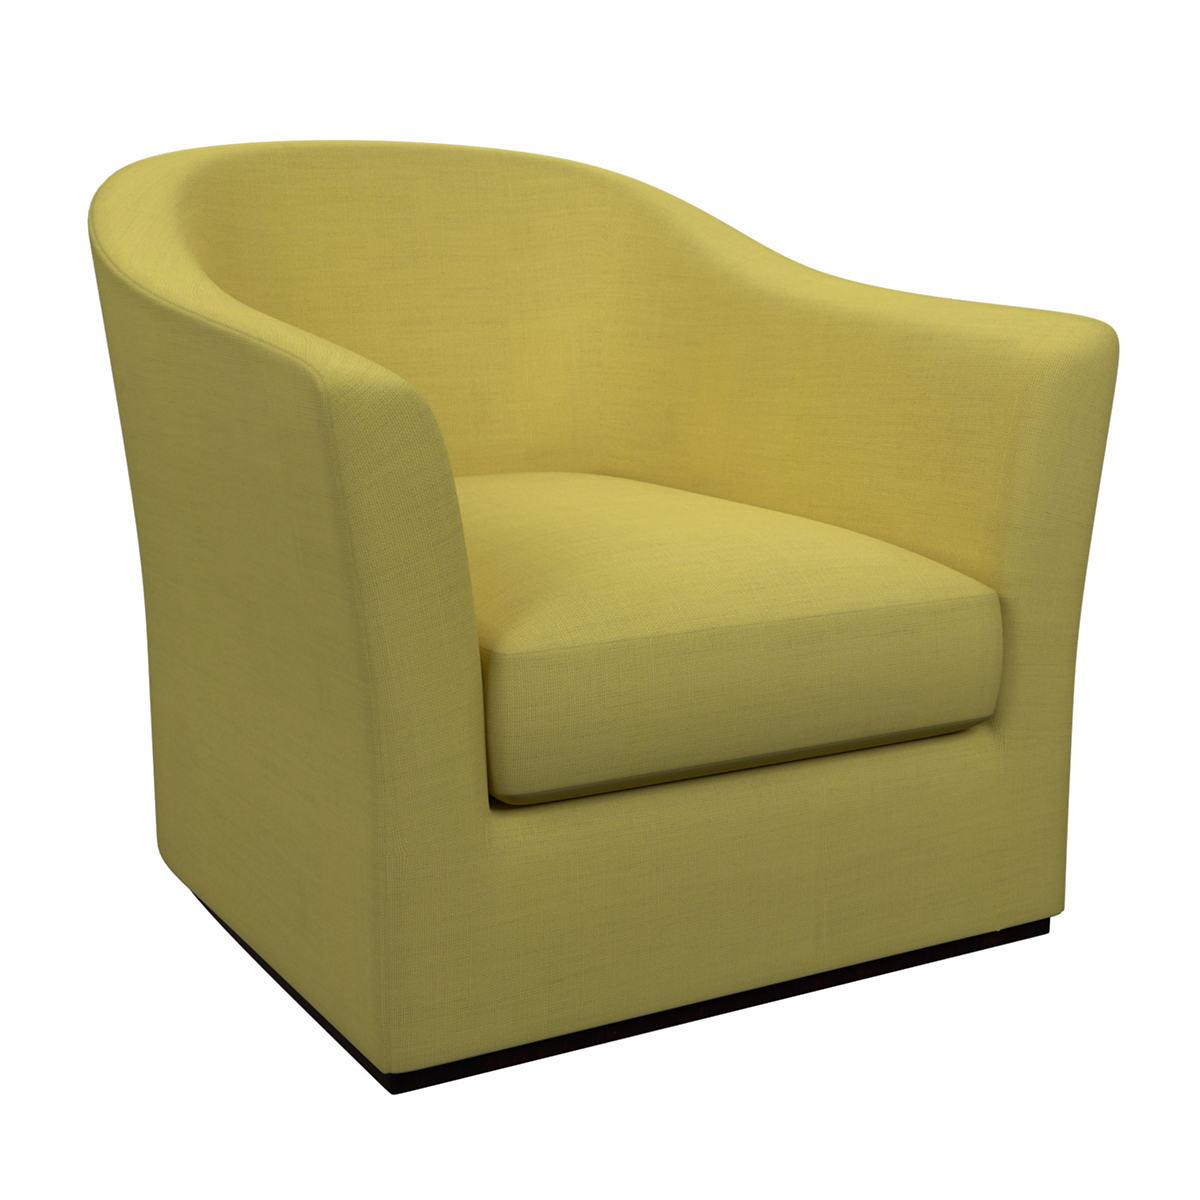 Estate Linen Citrus Thunderbird Chair